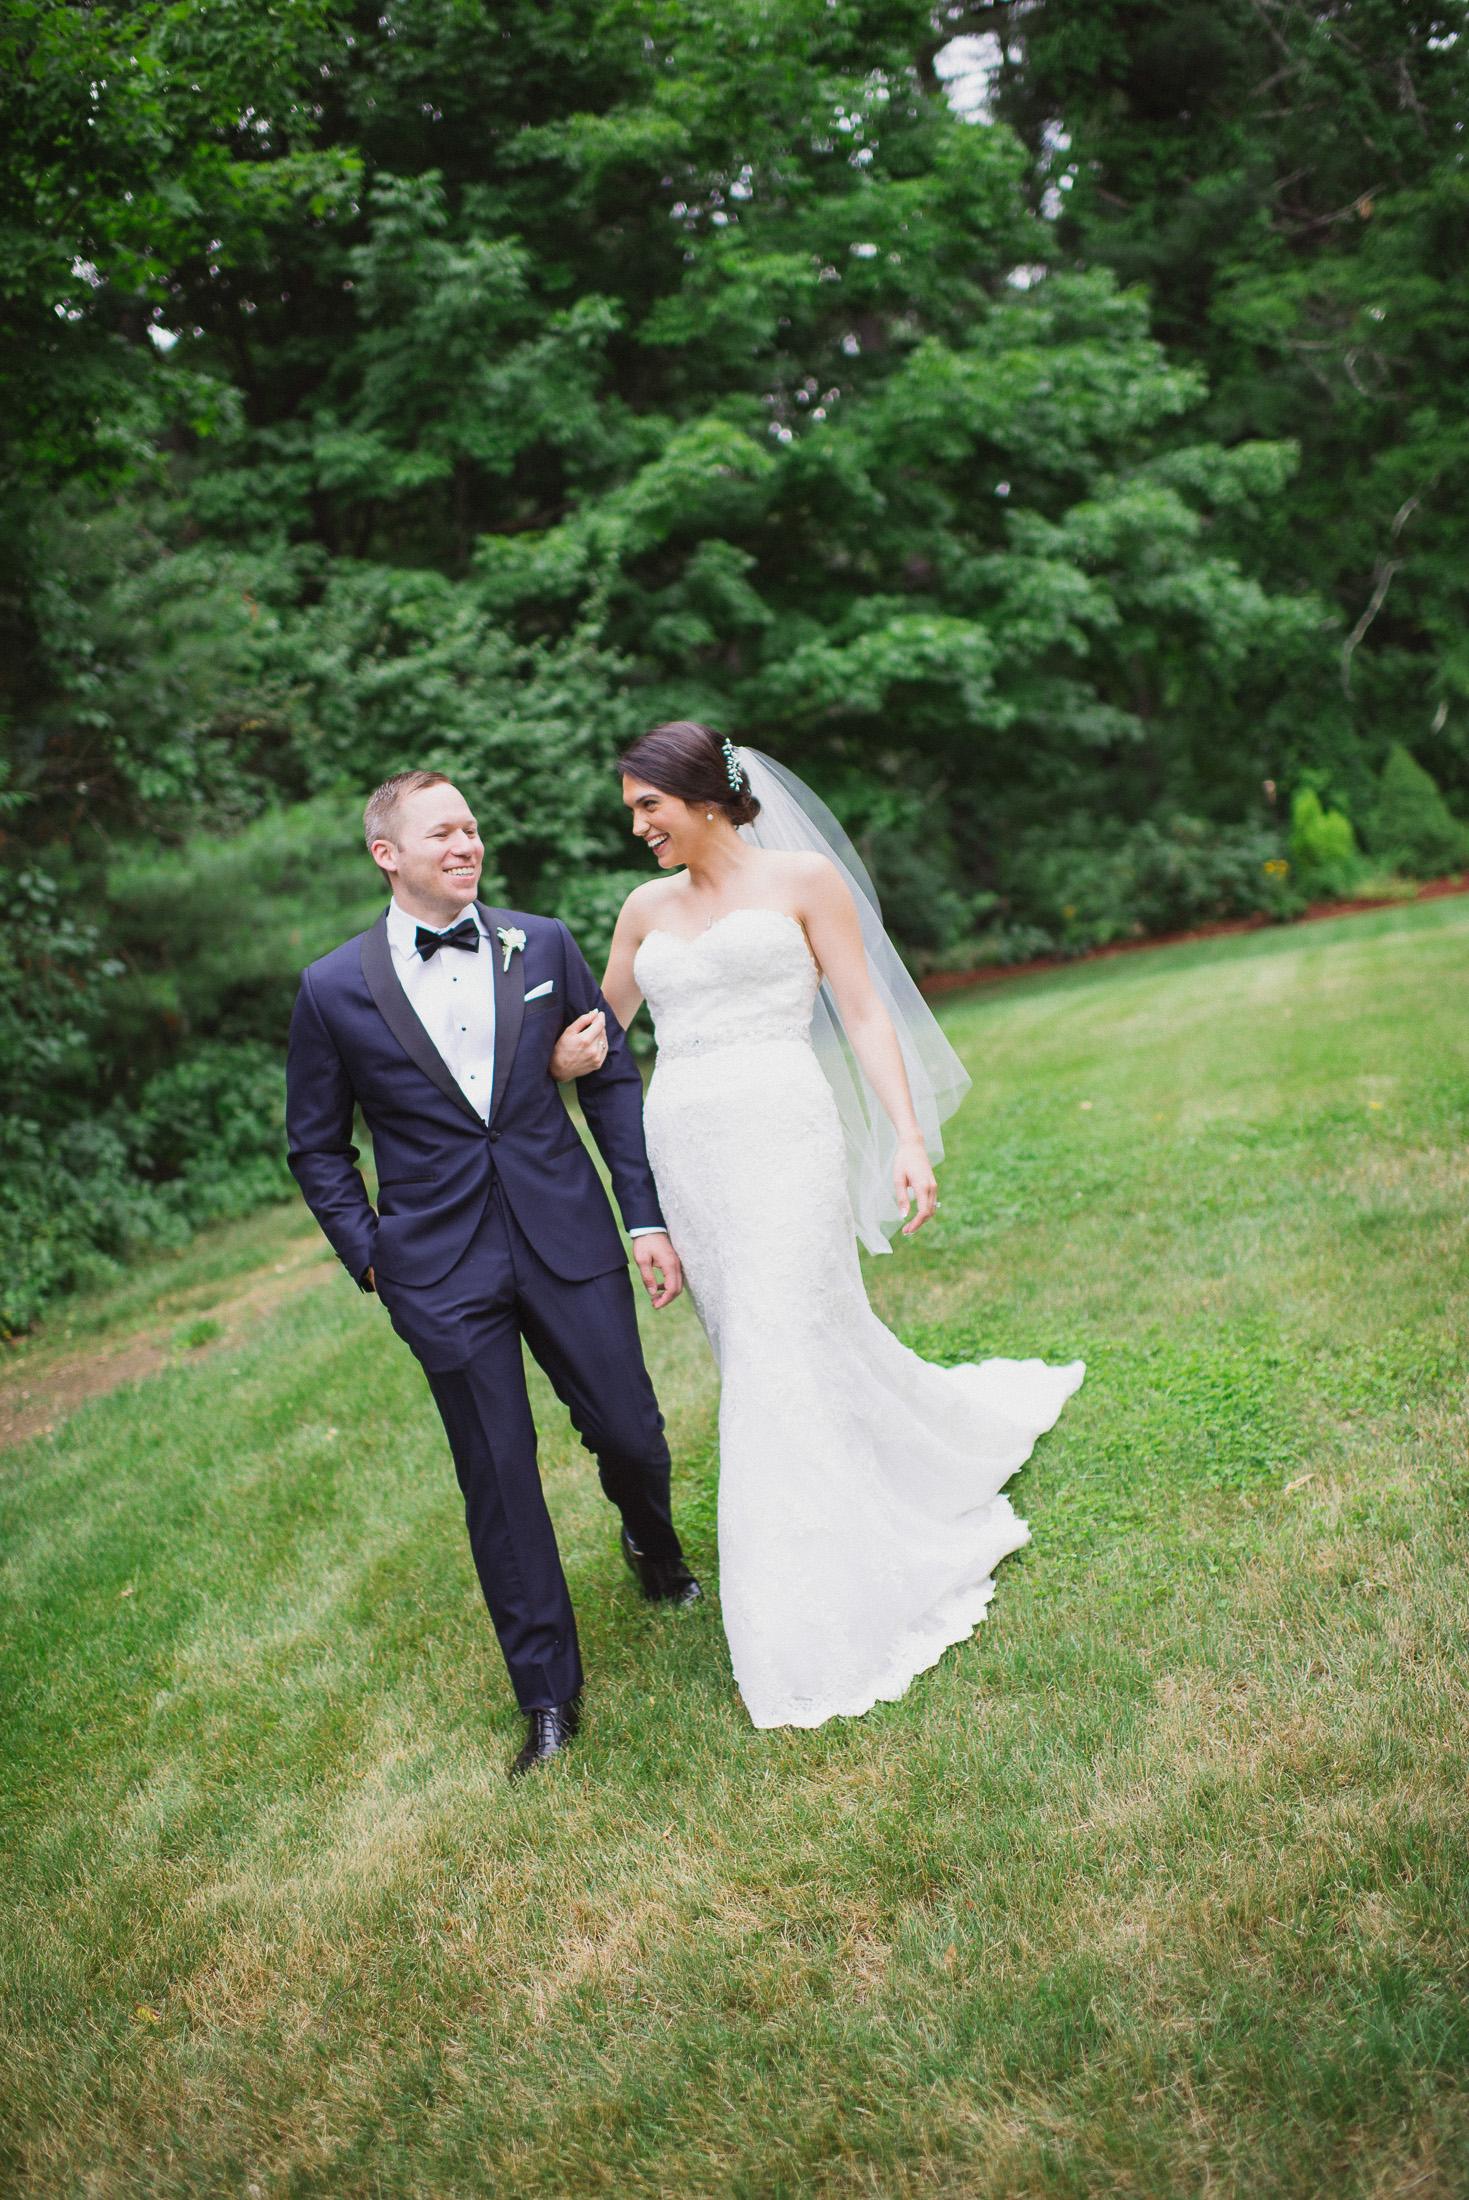 NH Wedding Photographer: walking together at BVI